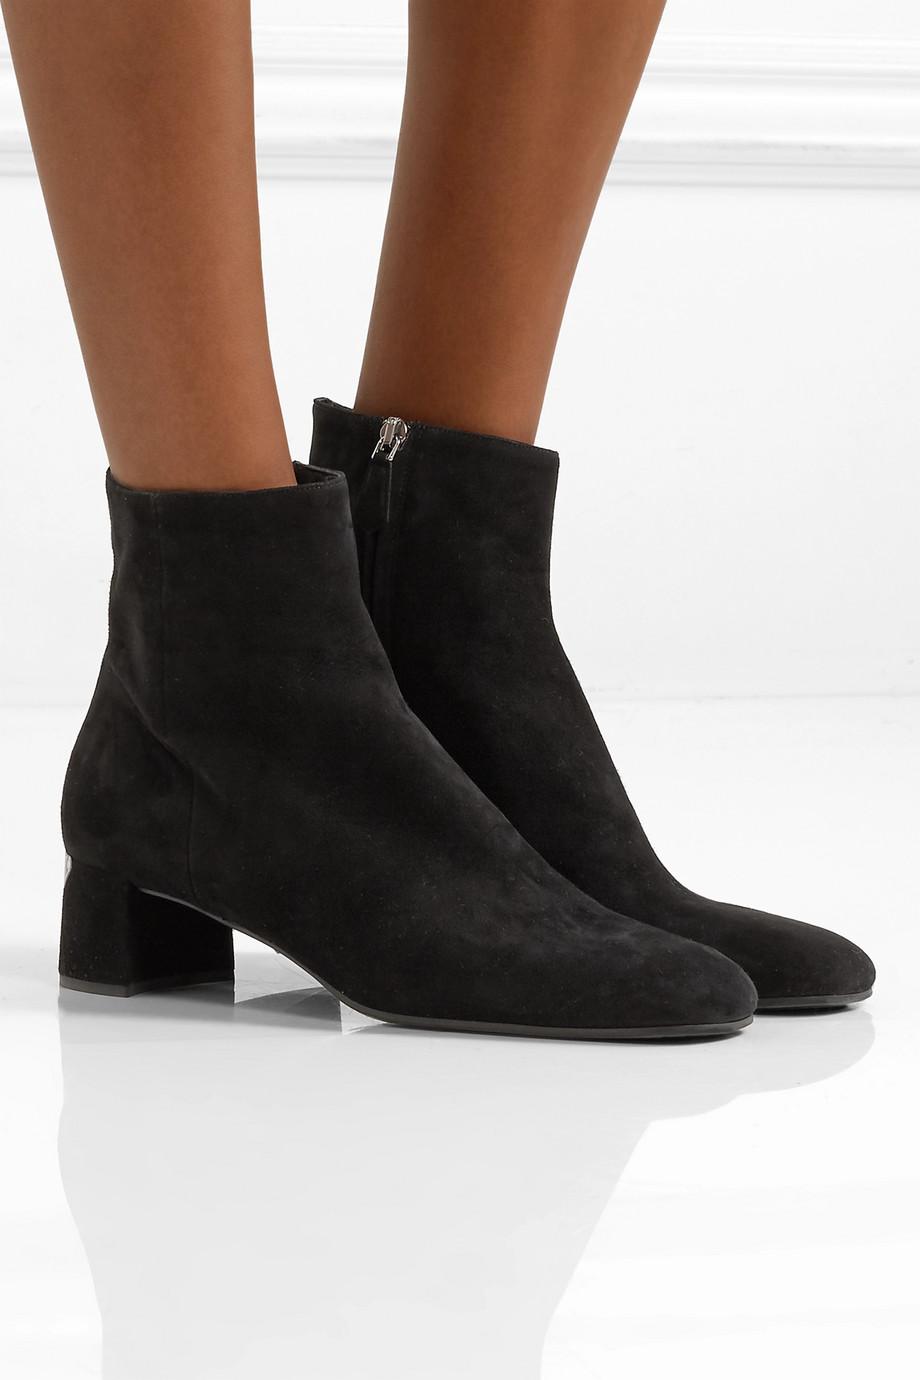 Prada 45 logo-appliquéd suede ankle boots